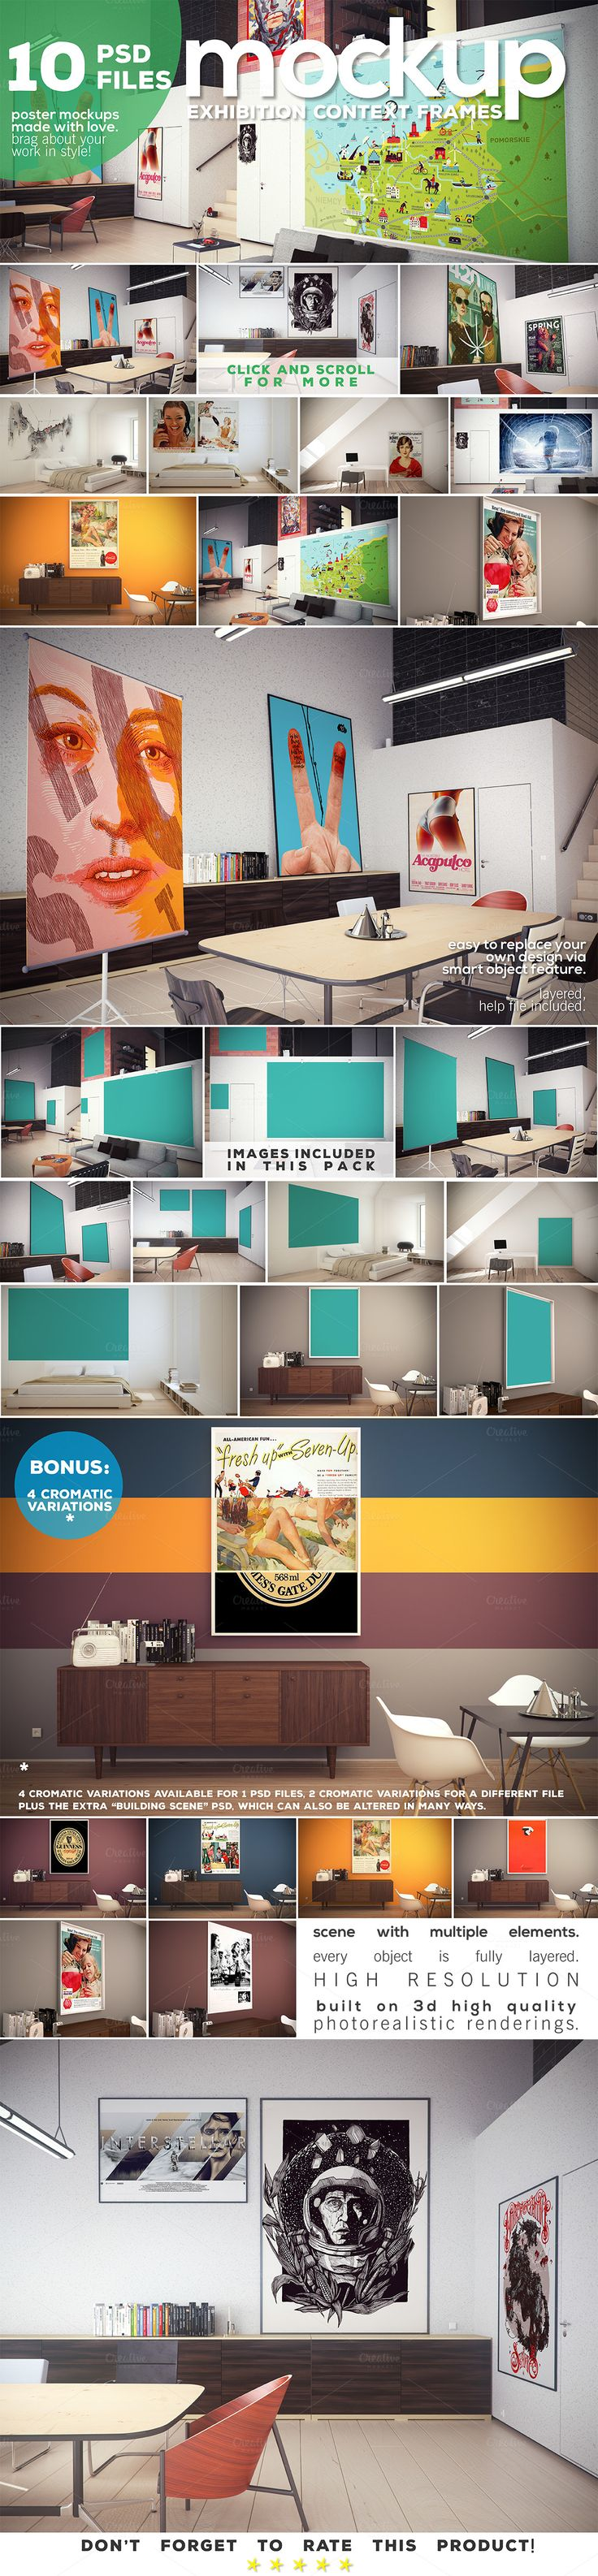 Poster Mockup vol.2 - Context Frames by DESIGNbook on Creative Market